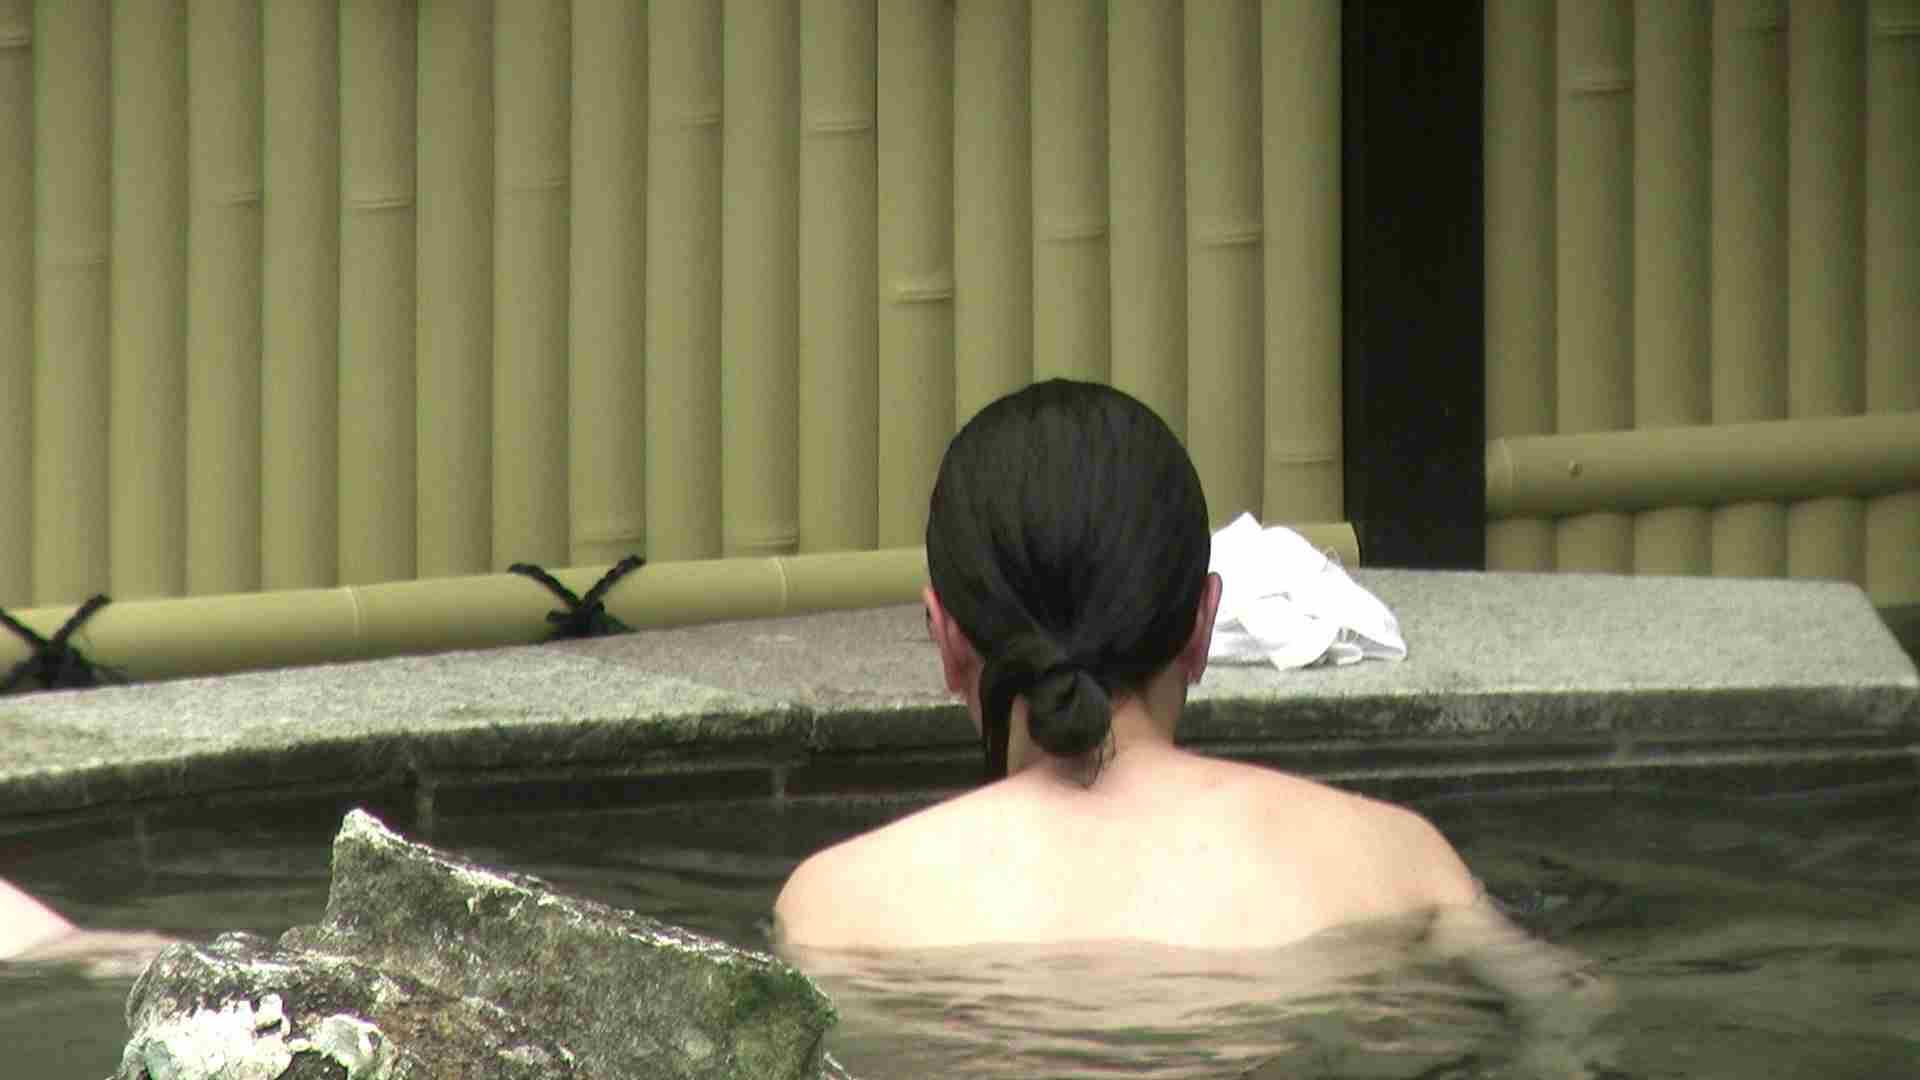 Aquaな露天風呂Vol.187 盗撮特撮  10pic 9